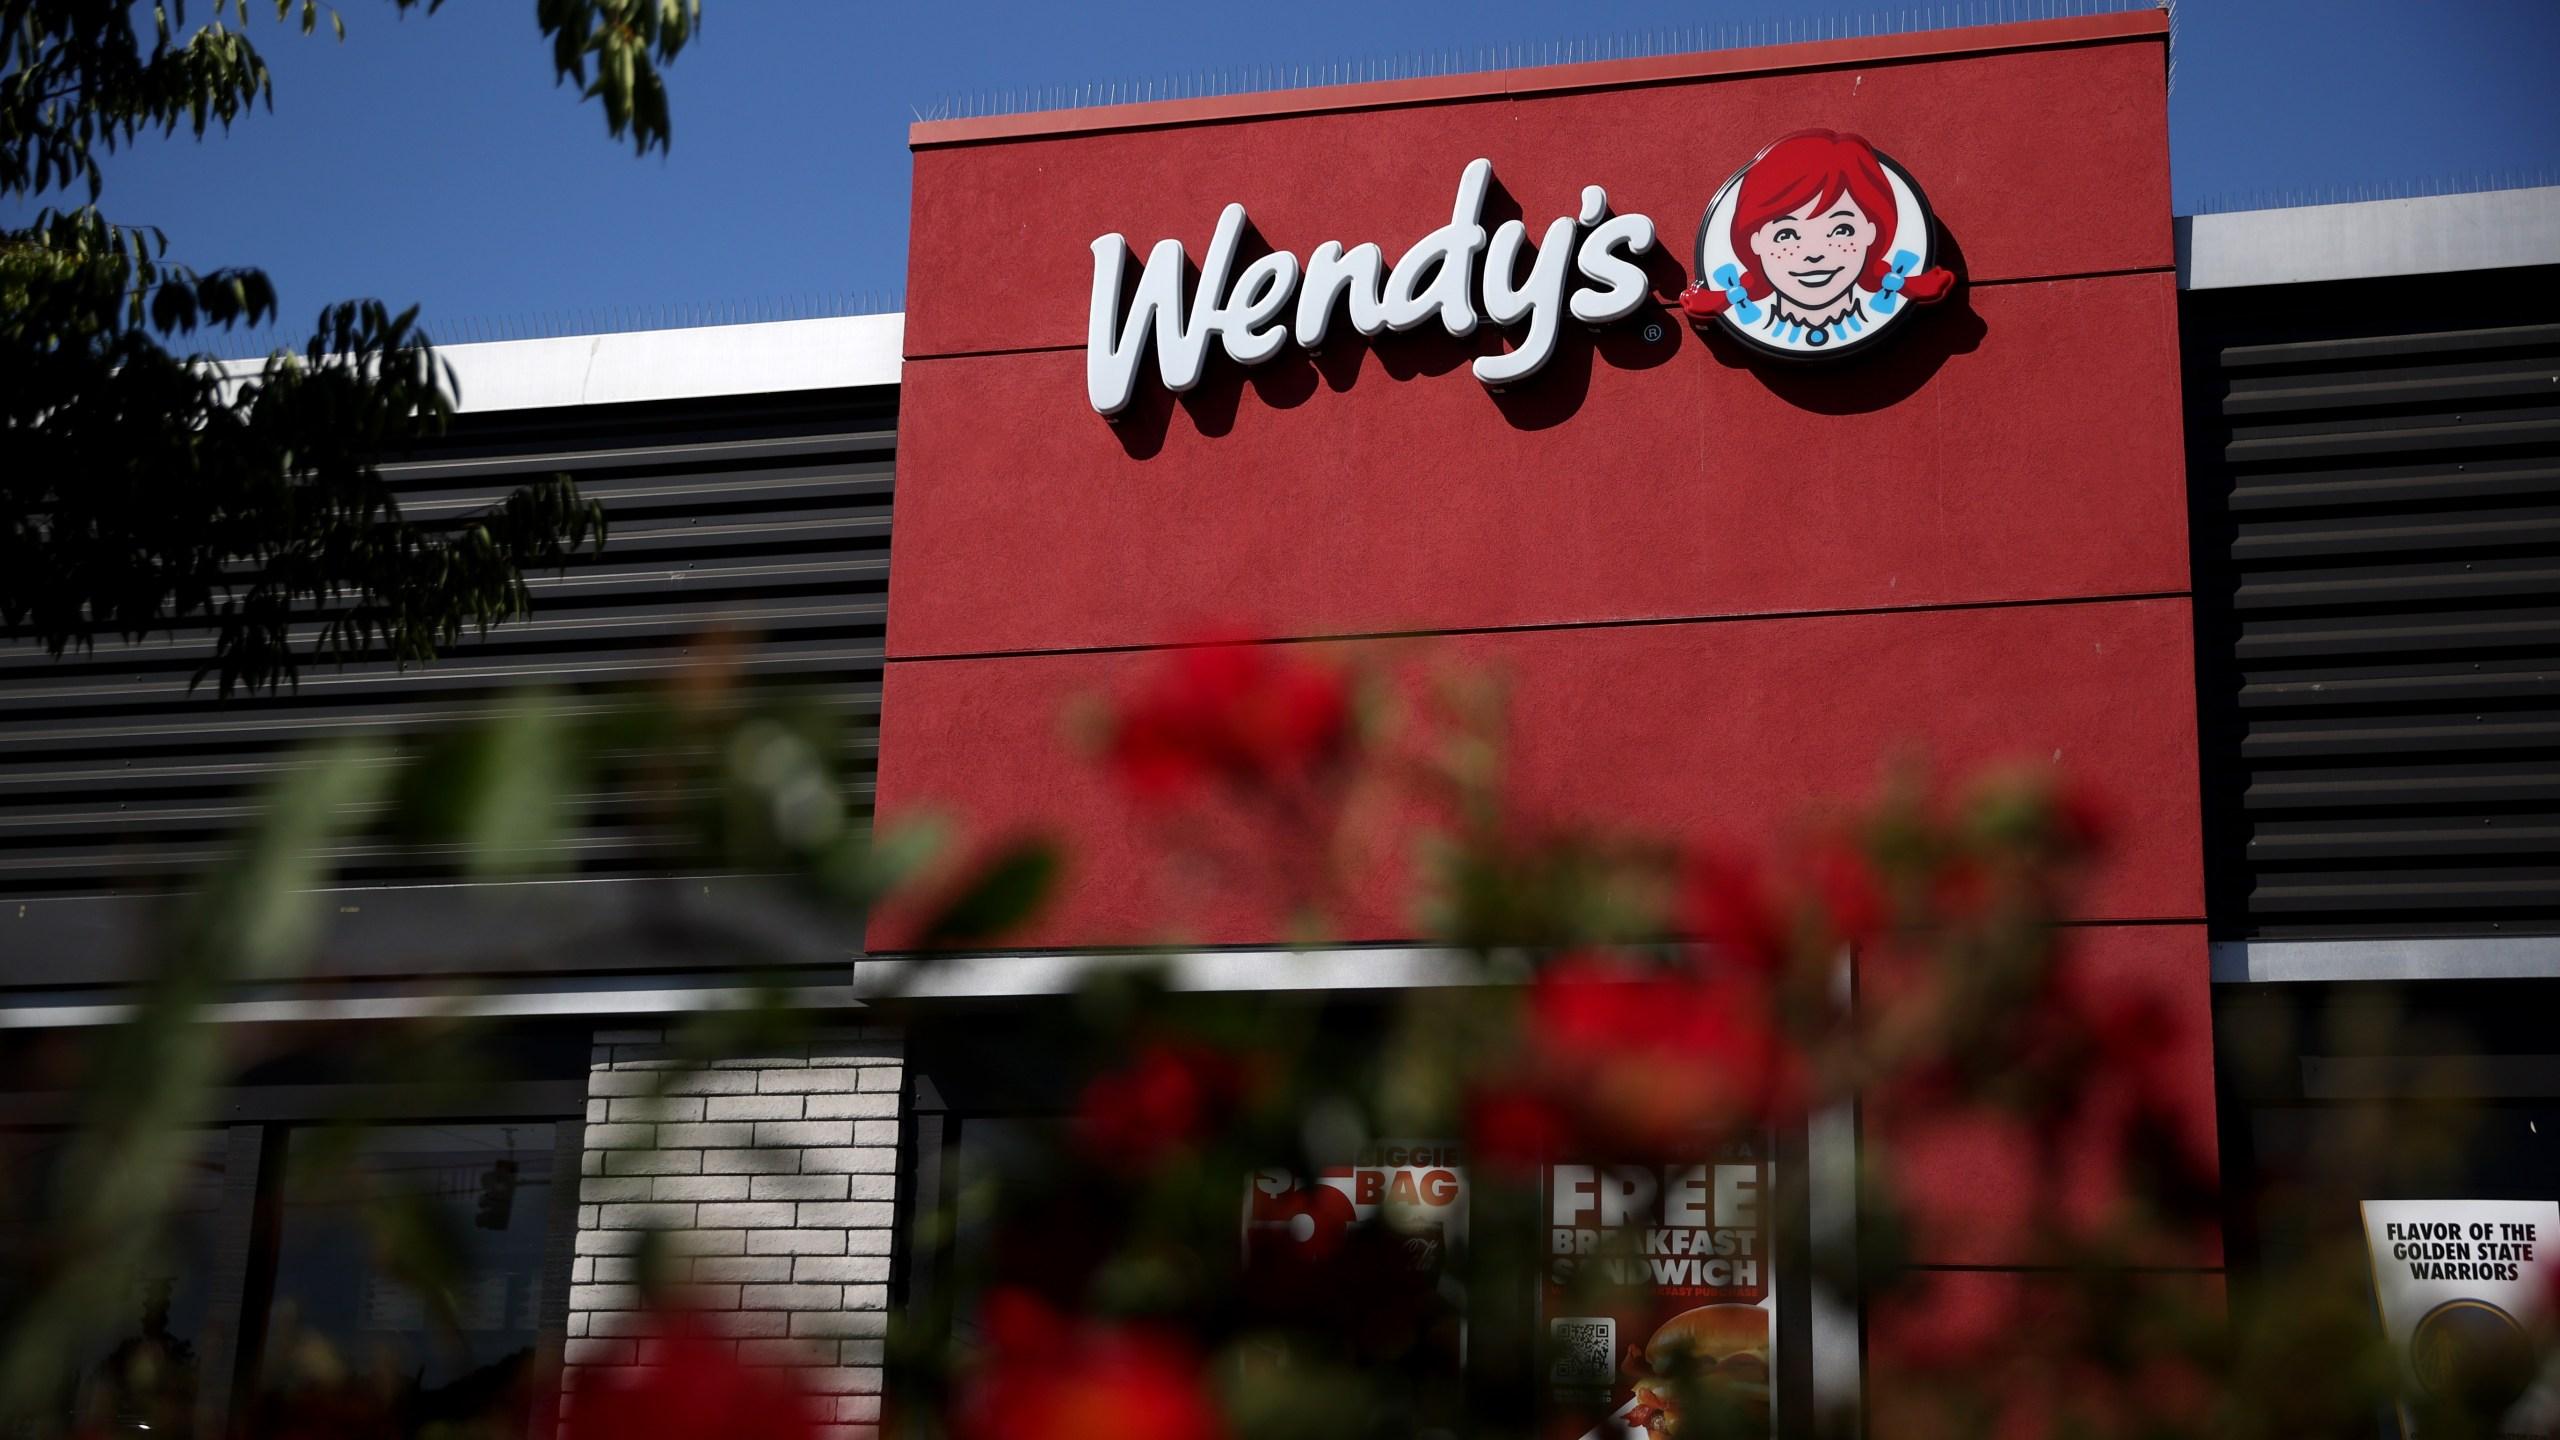 Wendy's haha